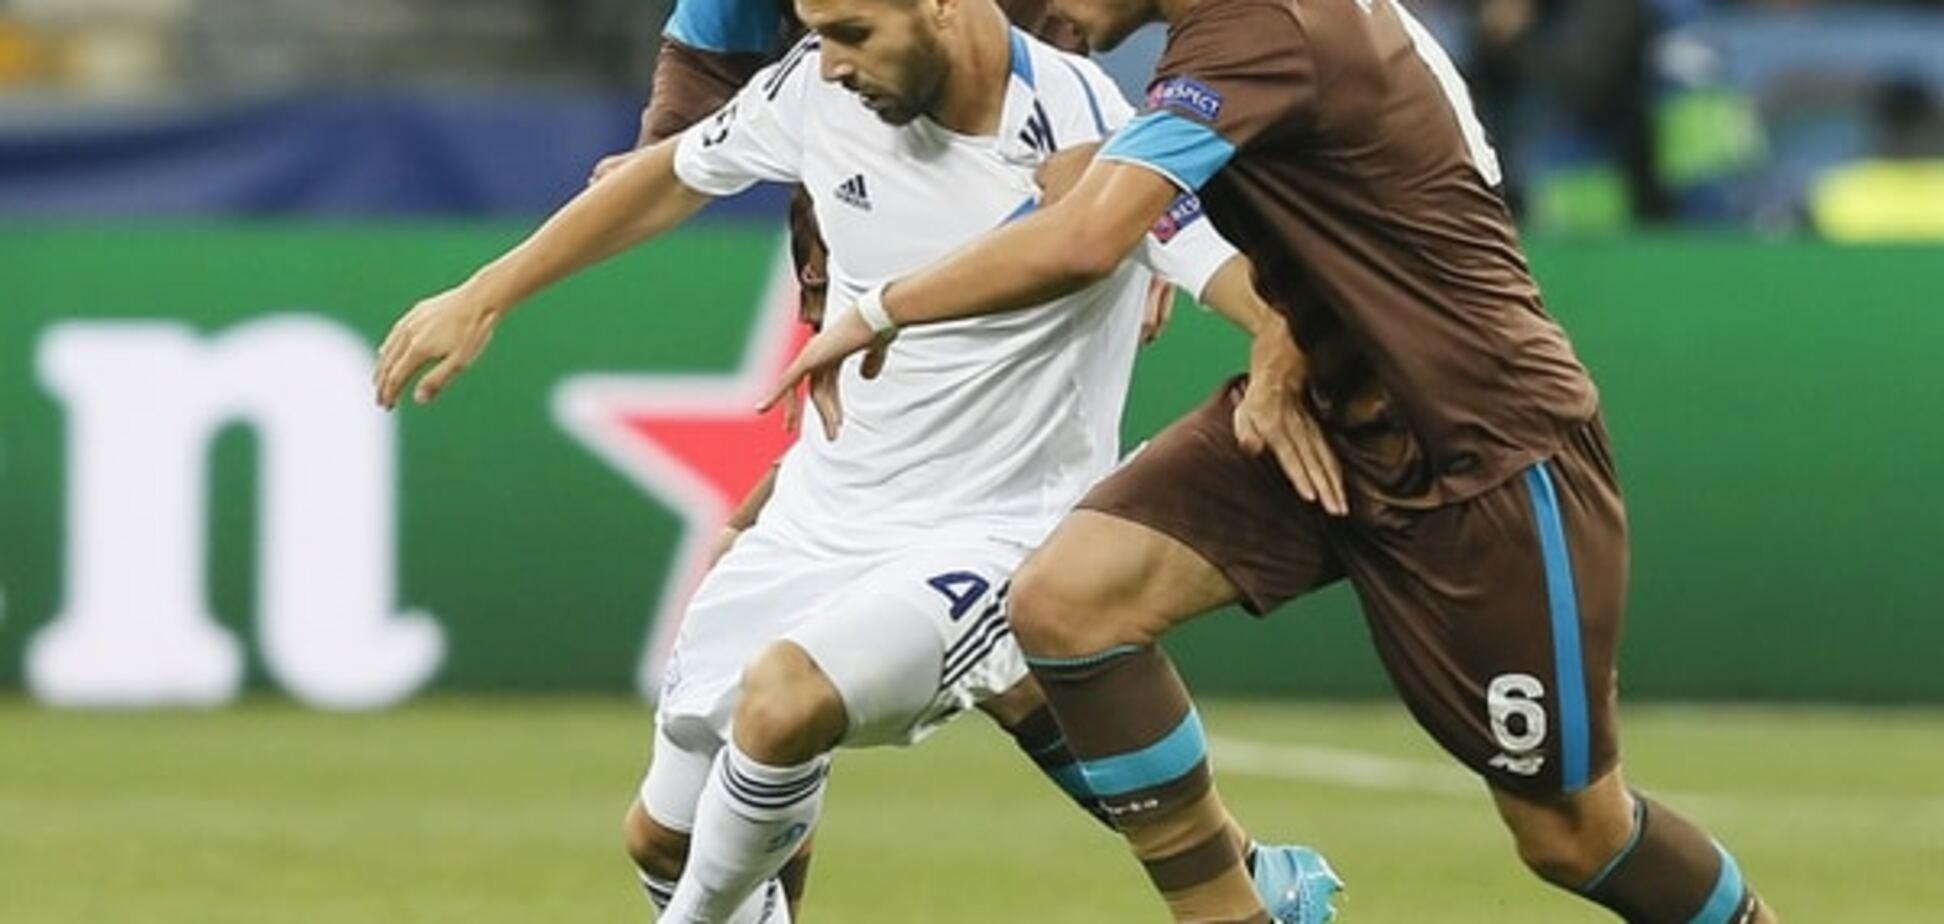 'Динамо' готовит трансфер полузащитника за 10 млн евро